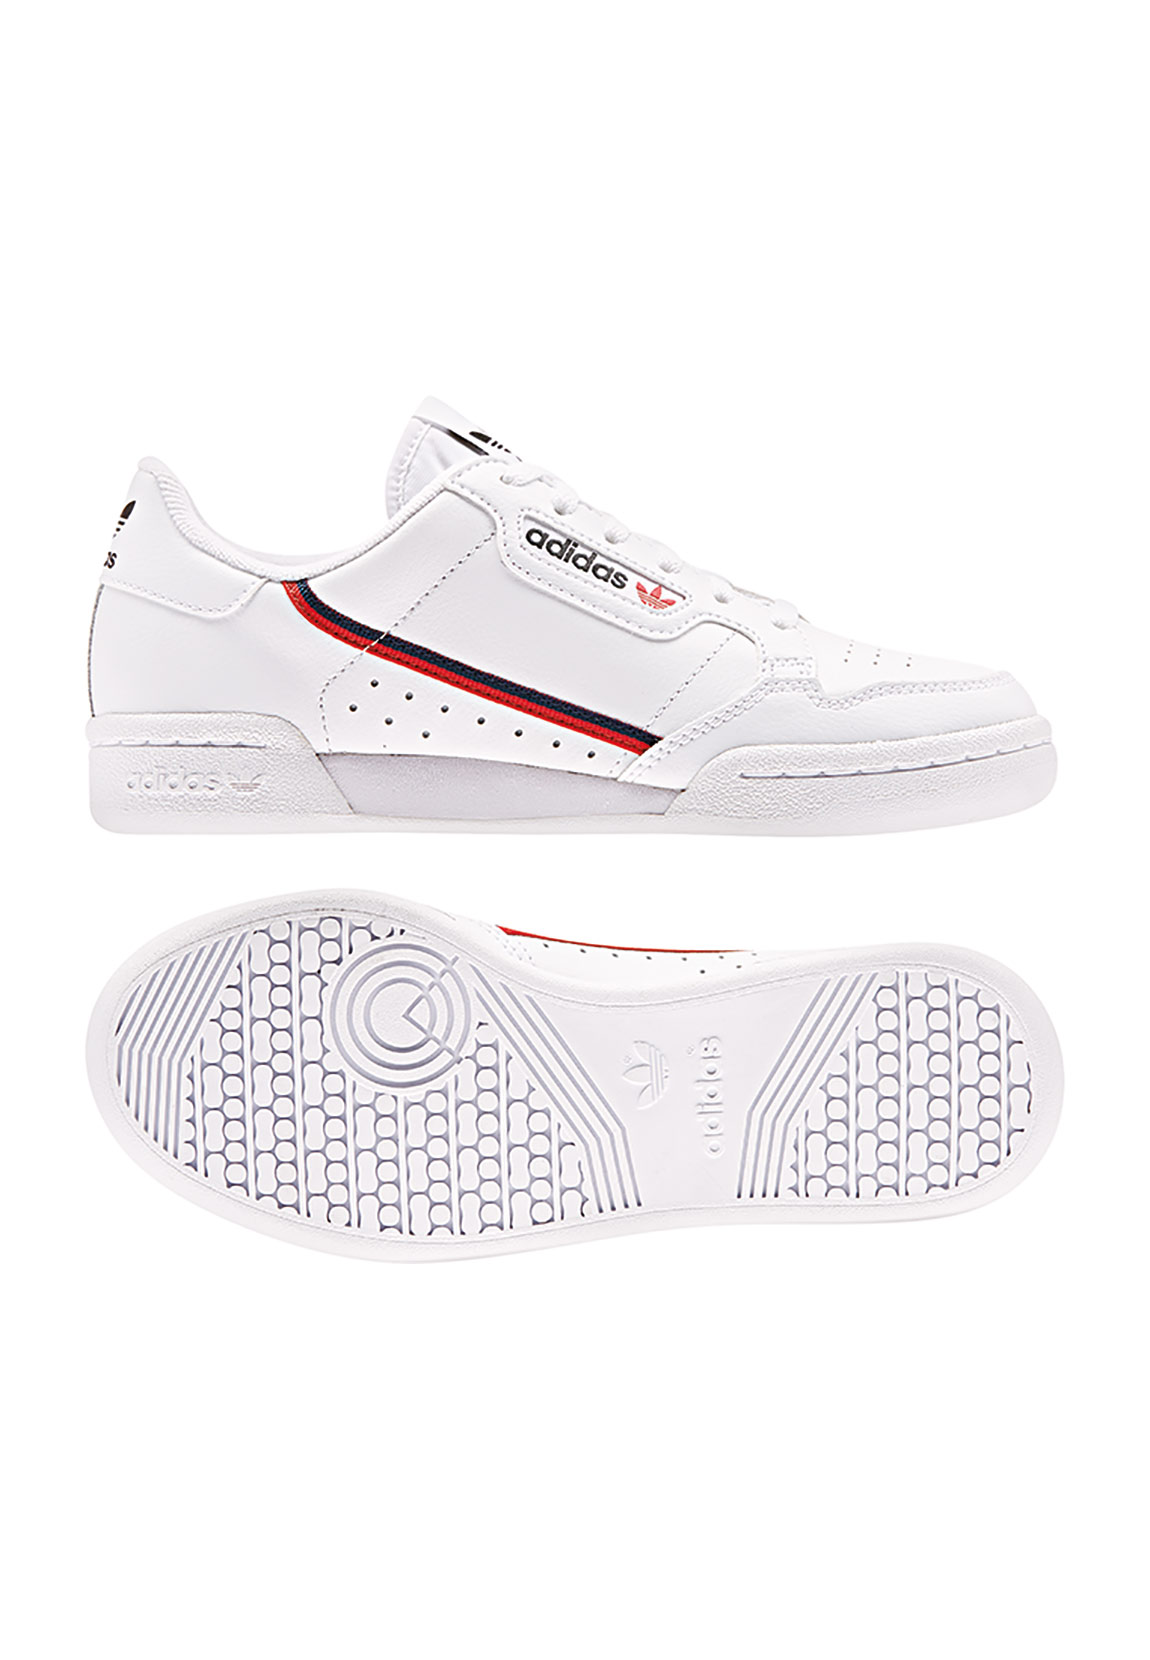 F99787 J Weiß Adidas Sneaker Originals Continental 80 kliuTZwOPX